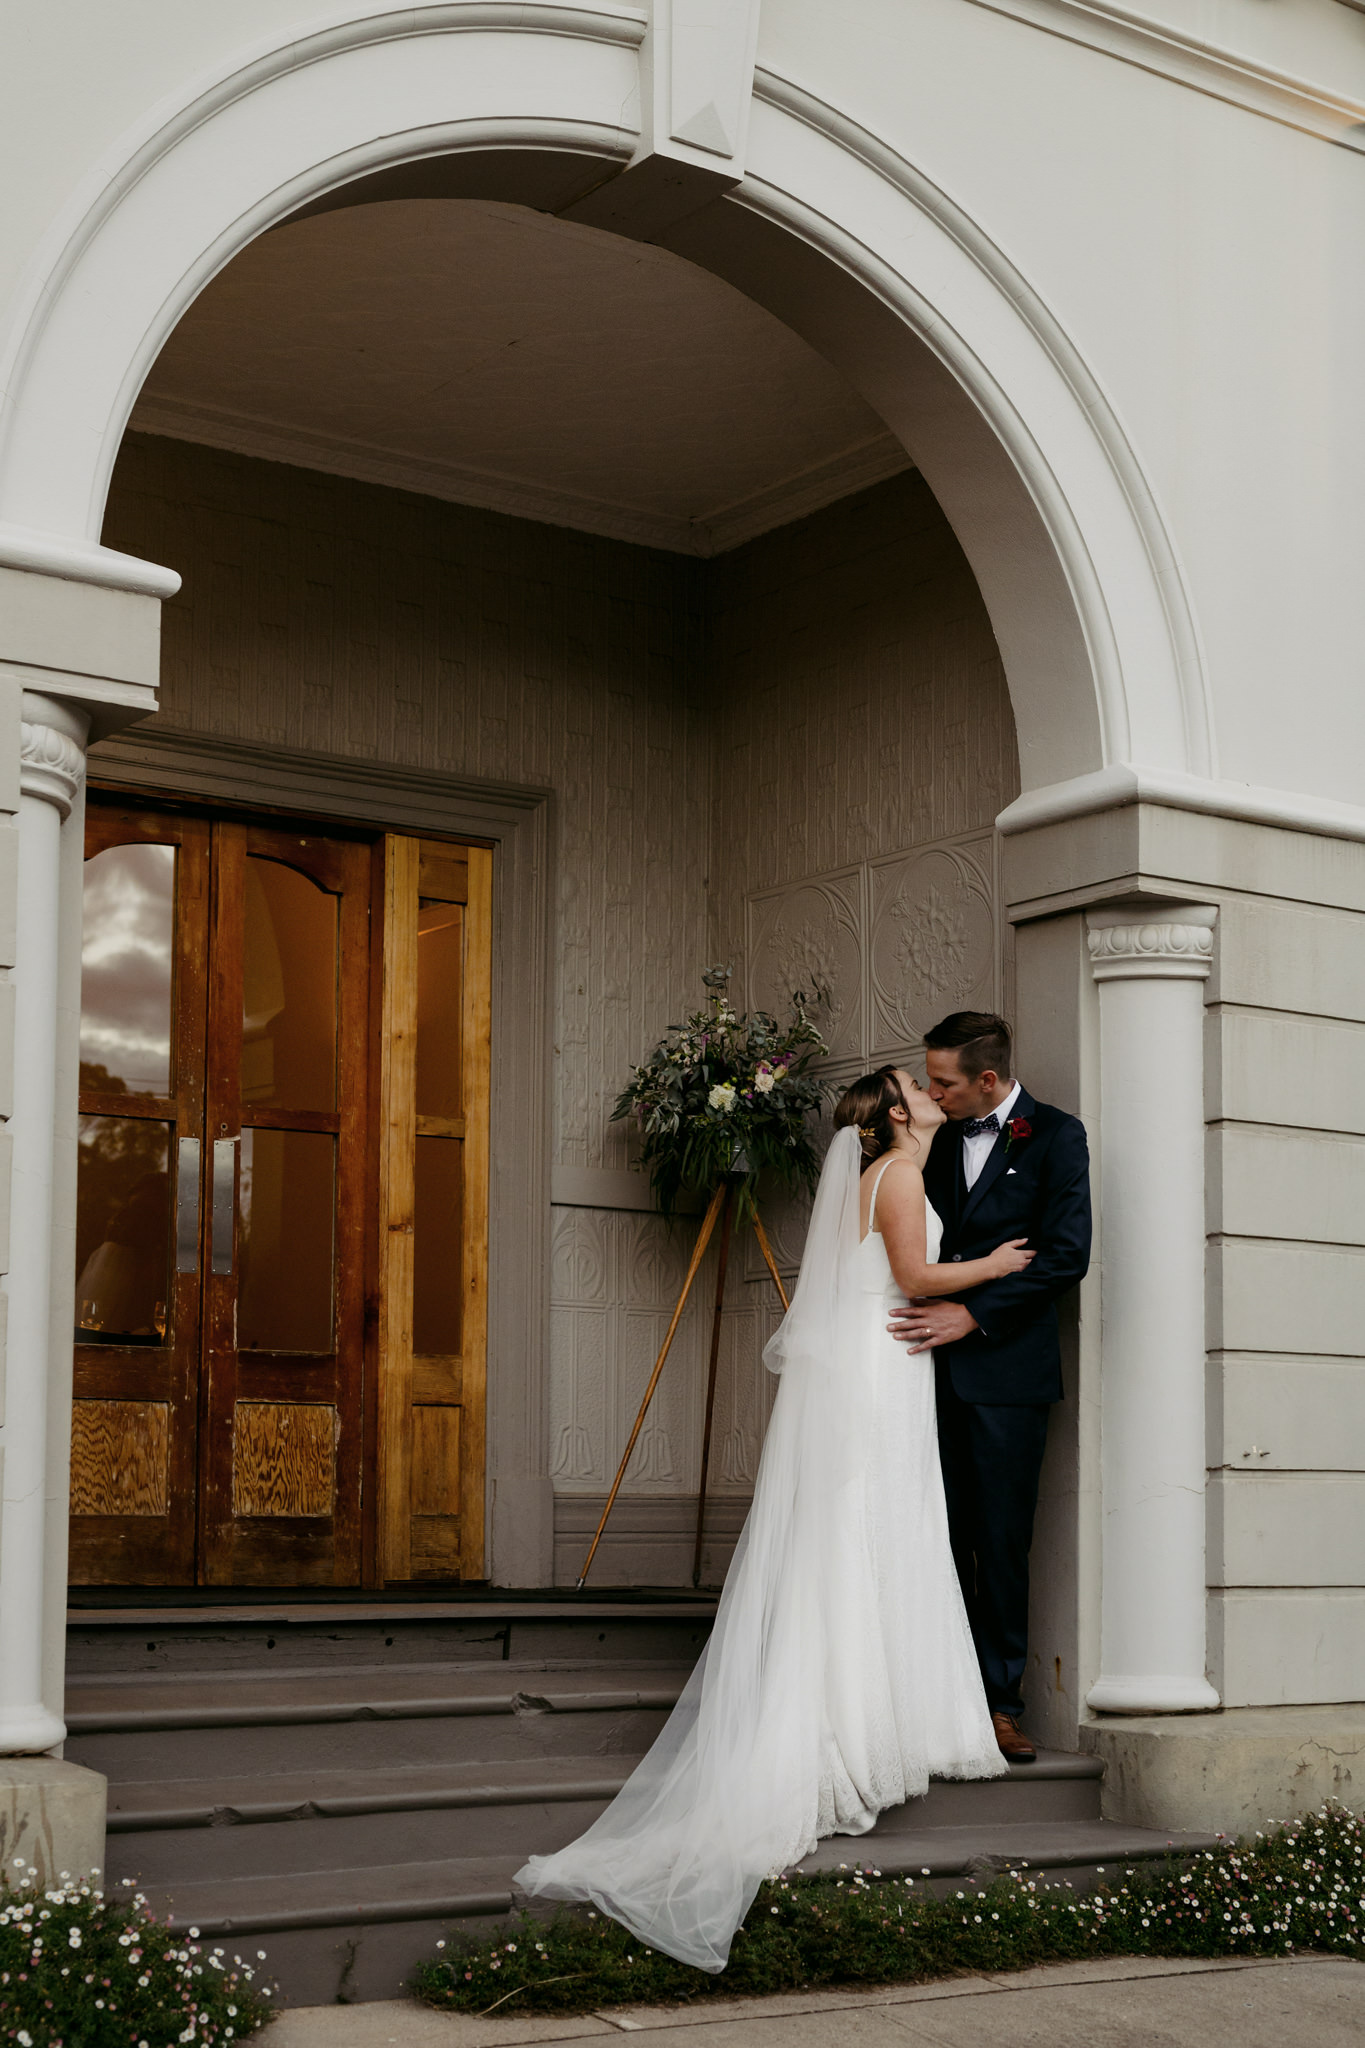 Erin Latimore Mudgee Canberra Wedding Photographer ROSEBANK GUESTHOUSE OLD THEATRE TONIC MILLTHORPE_704.JPG